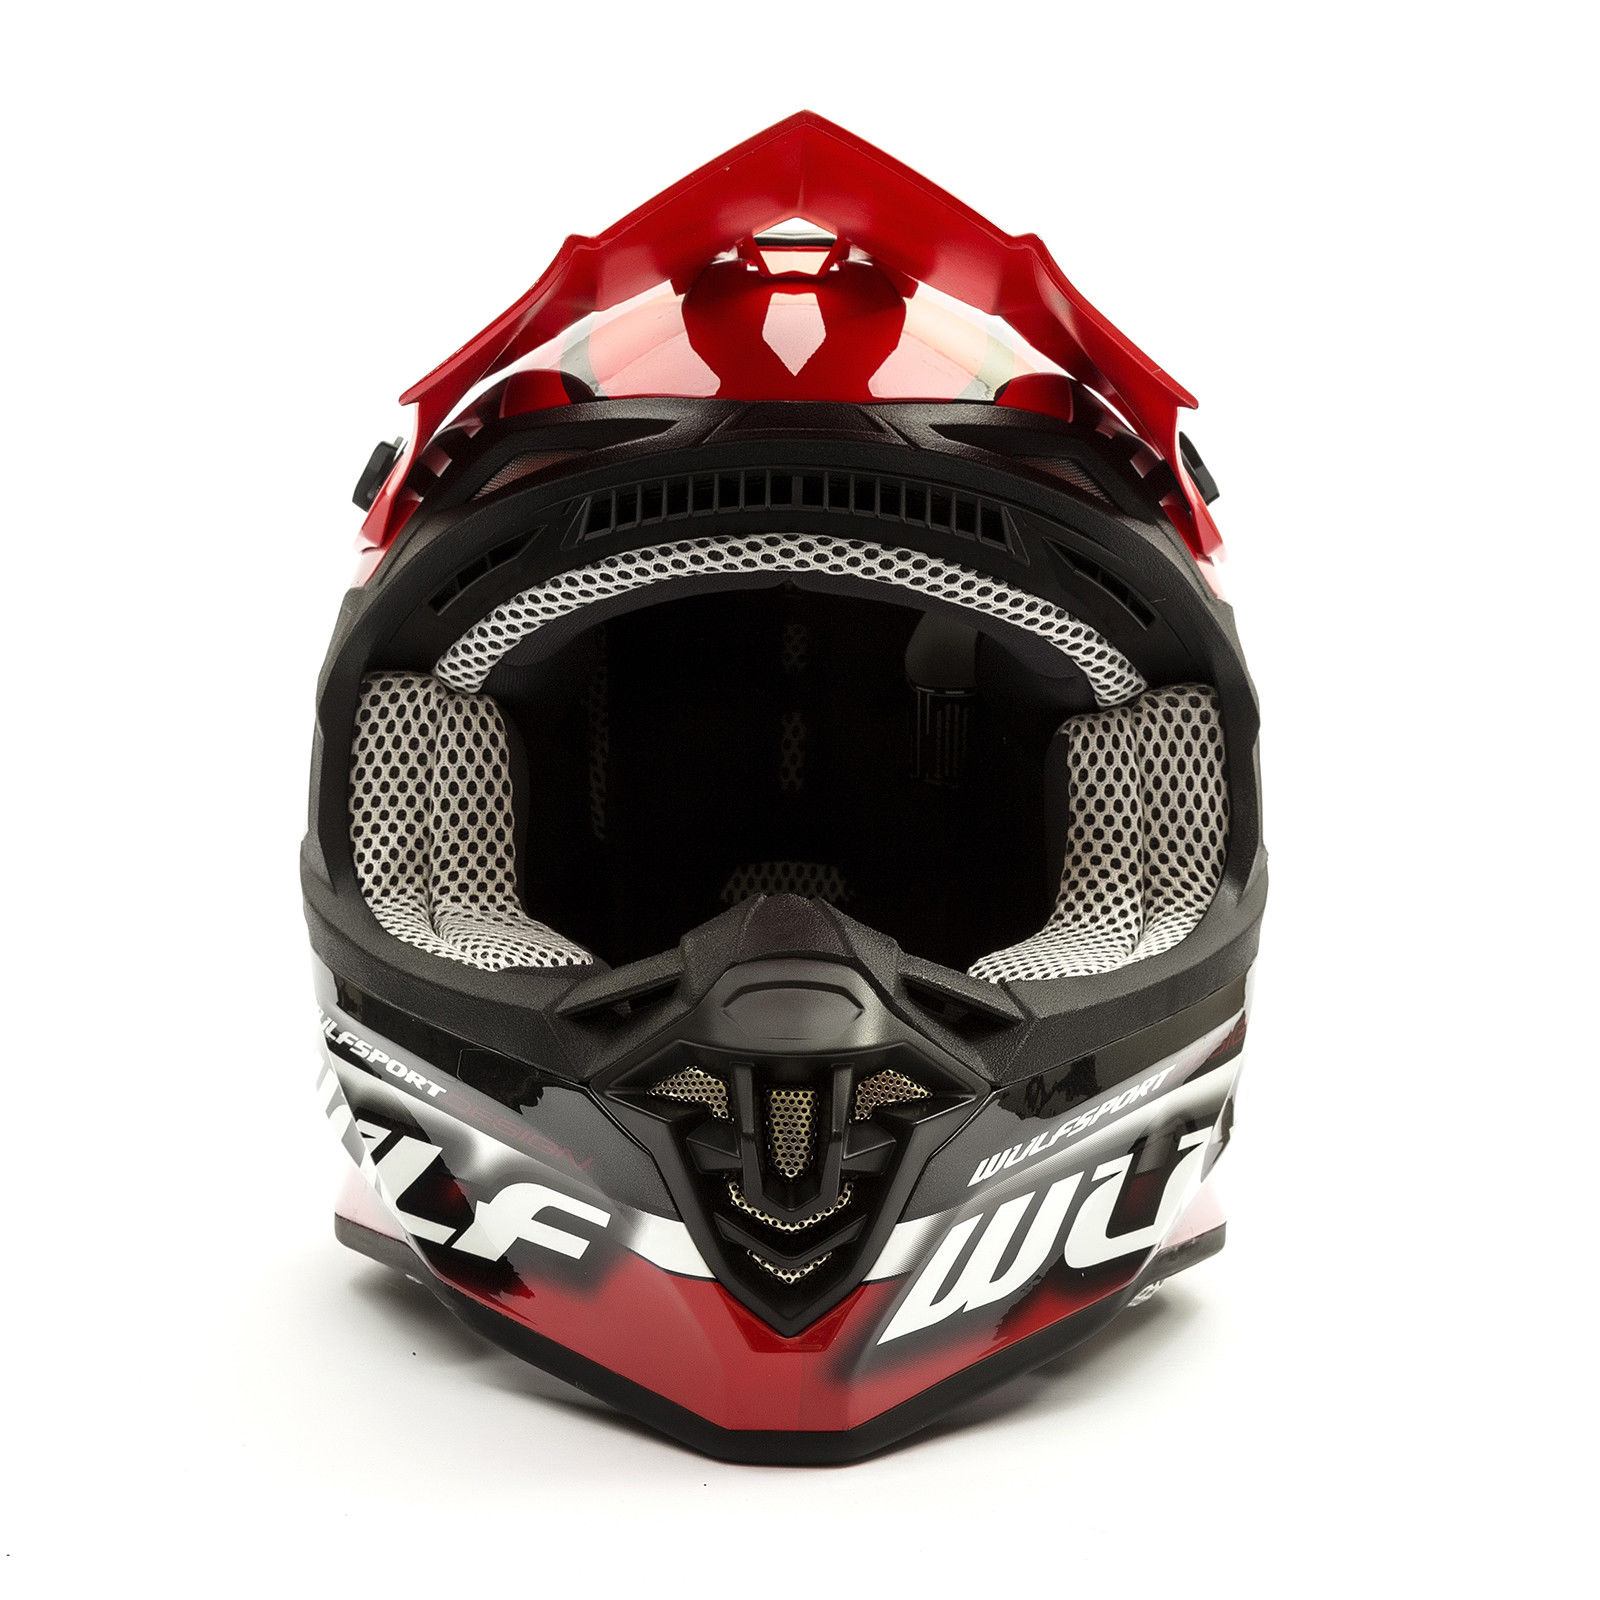 Wulfsport-Adult-Sceptre-Helmets-Motocross-Pitbike-Motorbike-Off-Road-Racing-ATV thumbnail 38